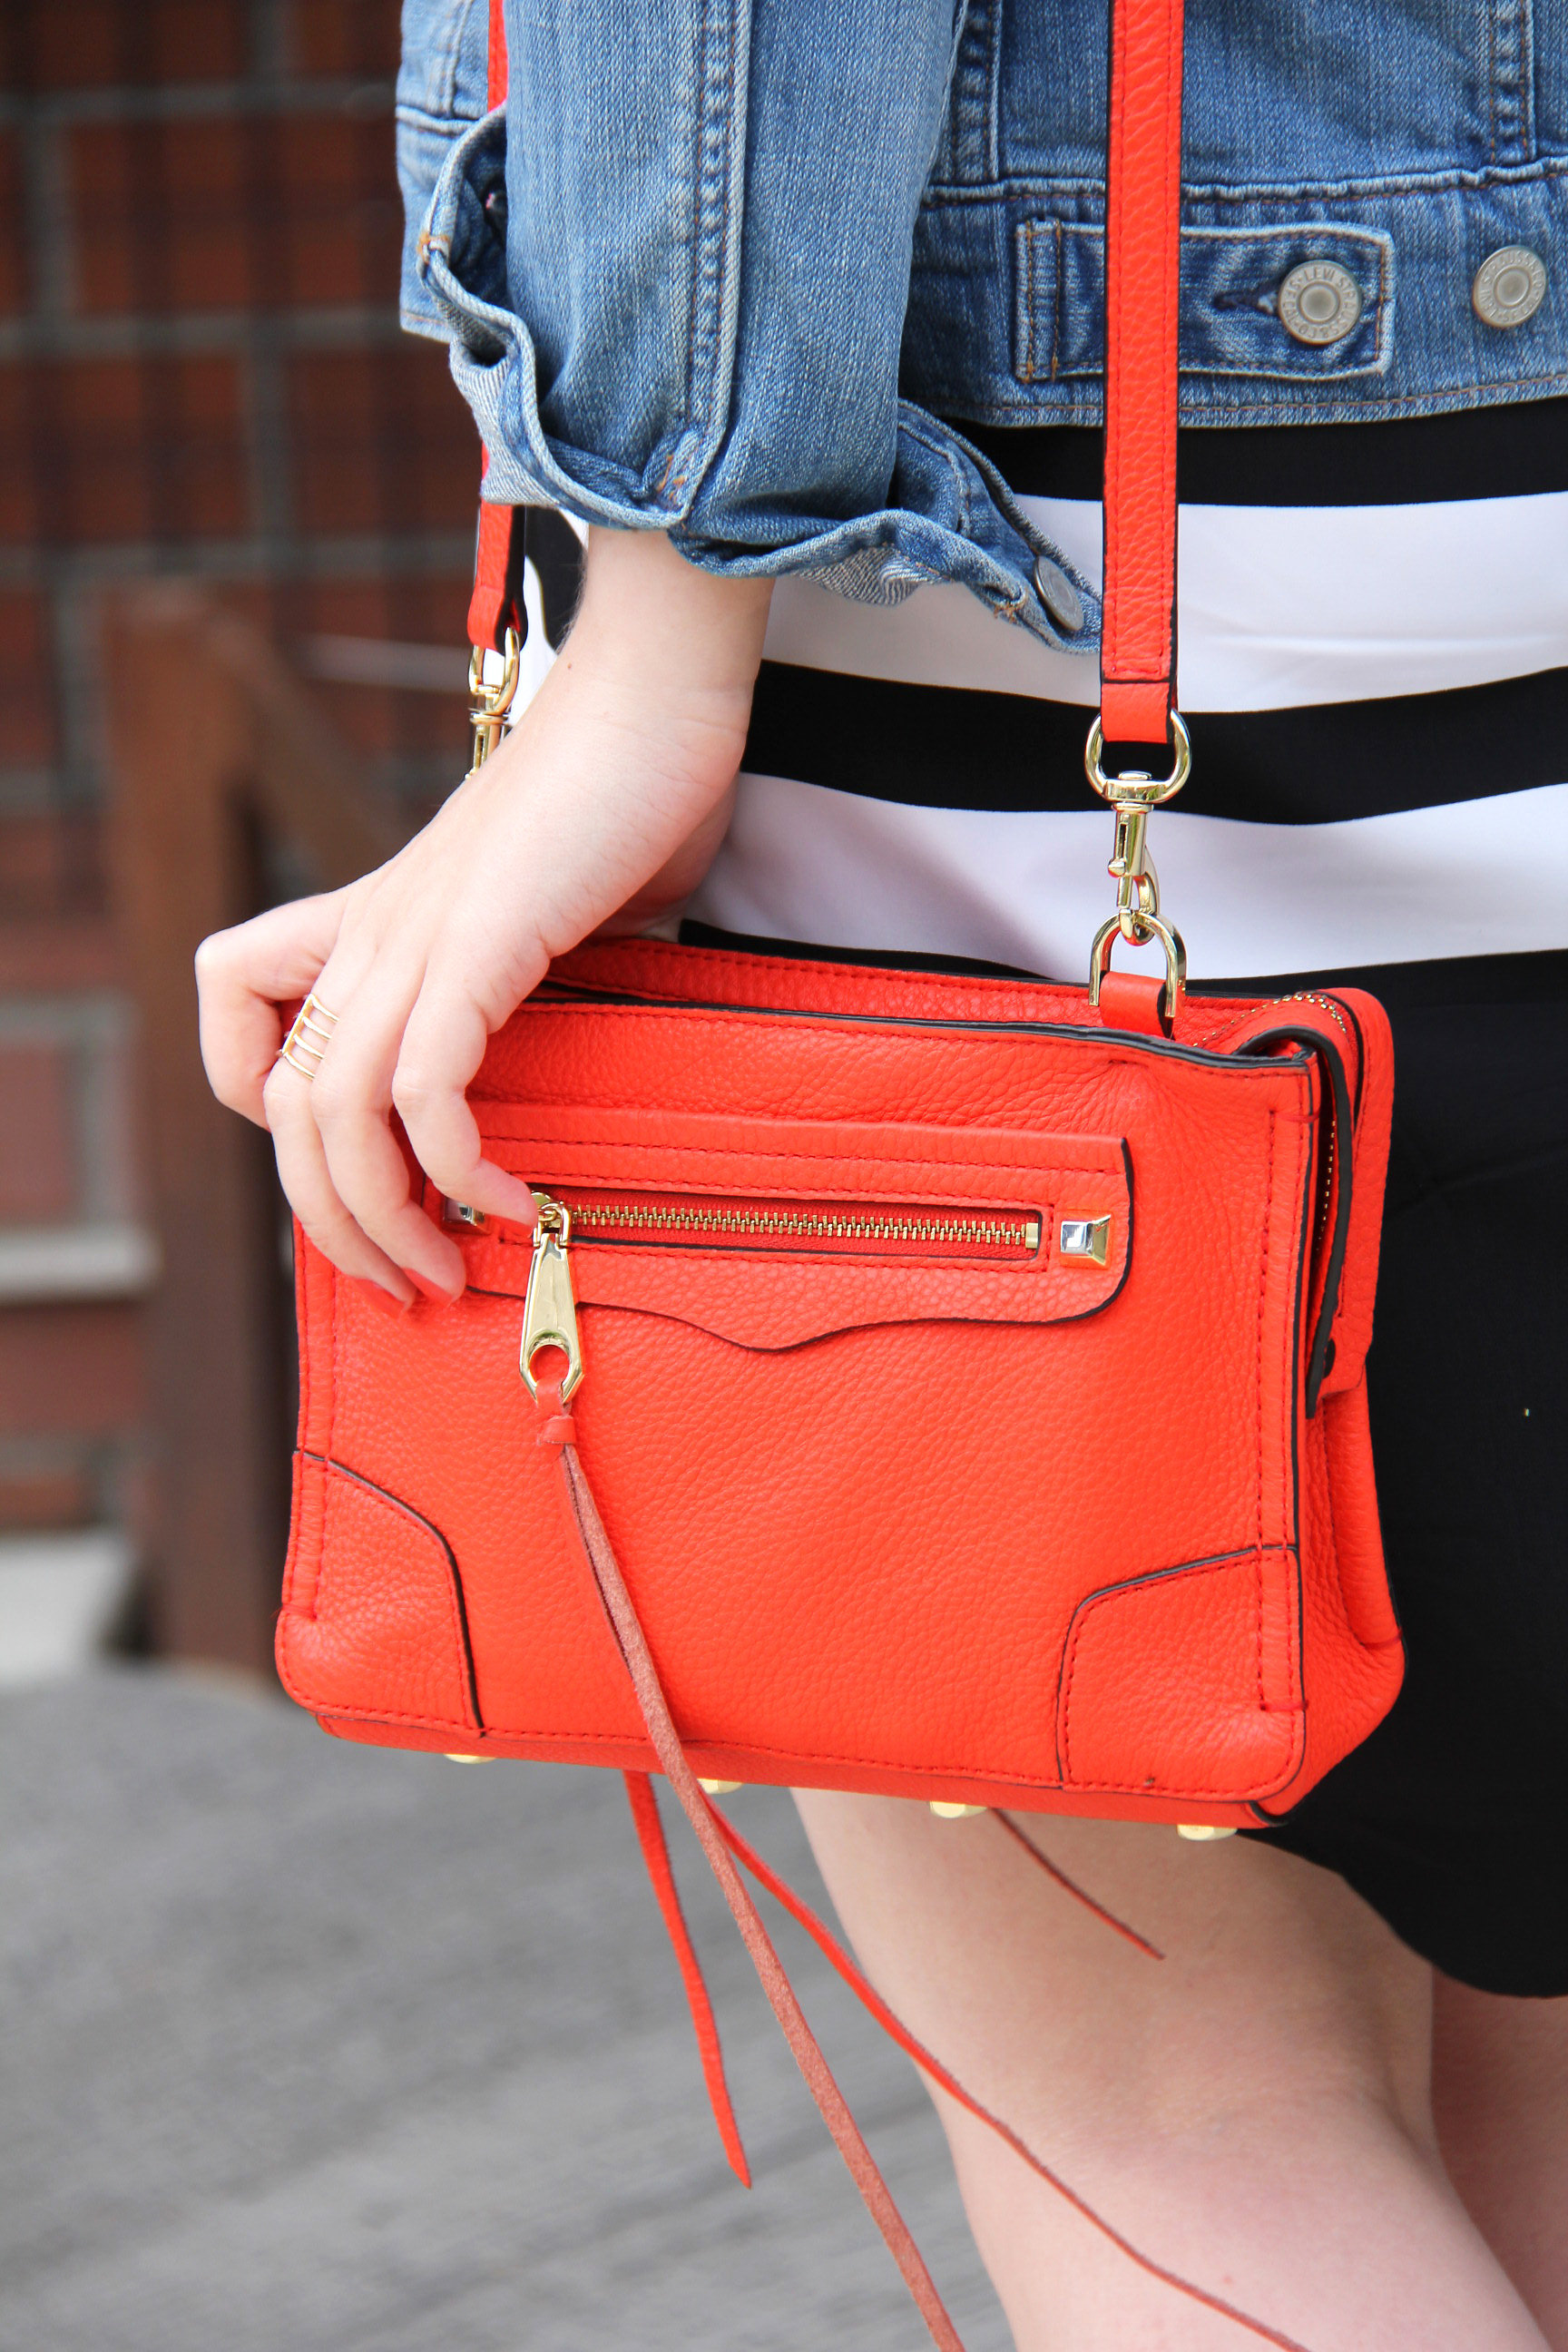 Summer Travel Outfit: Rebecca Minkoff Regan Crossbody in Poppy // Hello Rigby Seattle Fashion Blog